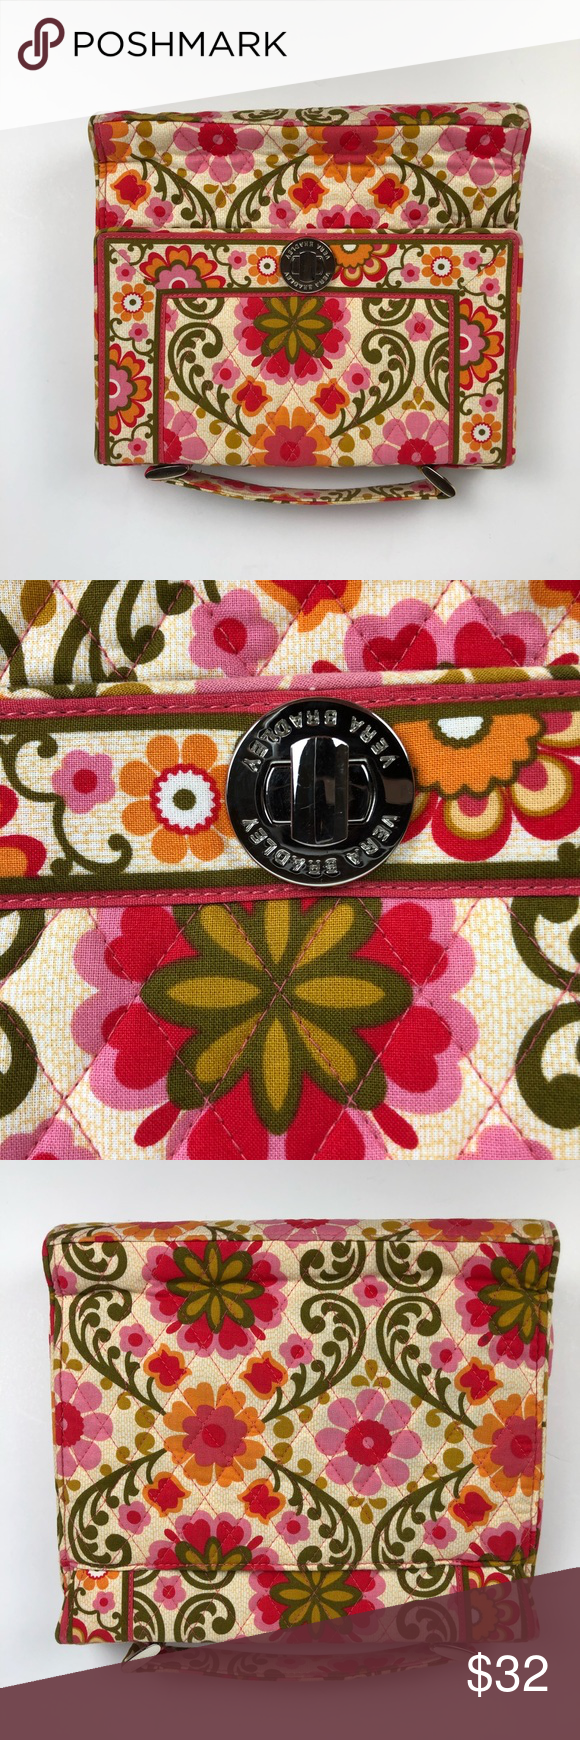 e4fe3a2788a4 Vera Bradley Julia Folkloric Retired Handbag Beautiful Vera Bradley ...